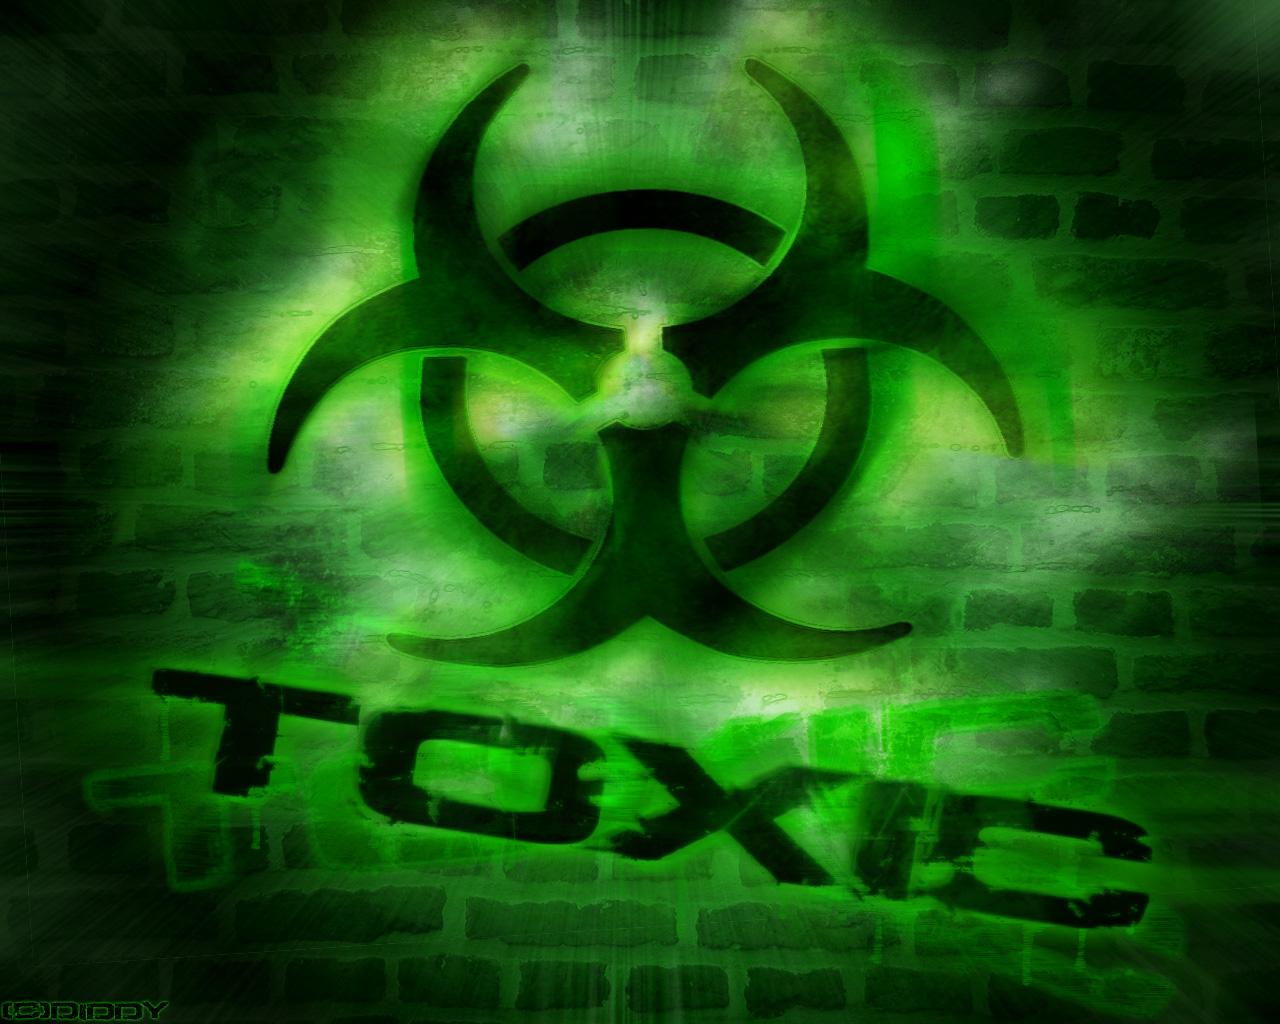 http://2.bp.blogspot.com/-Cri6OjPfhfo/ThV4yT5l1uI/AAAAAAAAANc/ldFxSnjuWzg/s1600/toxic%2Bgreen.jpg